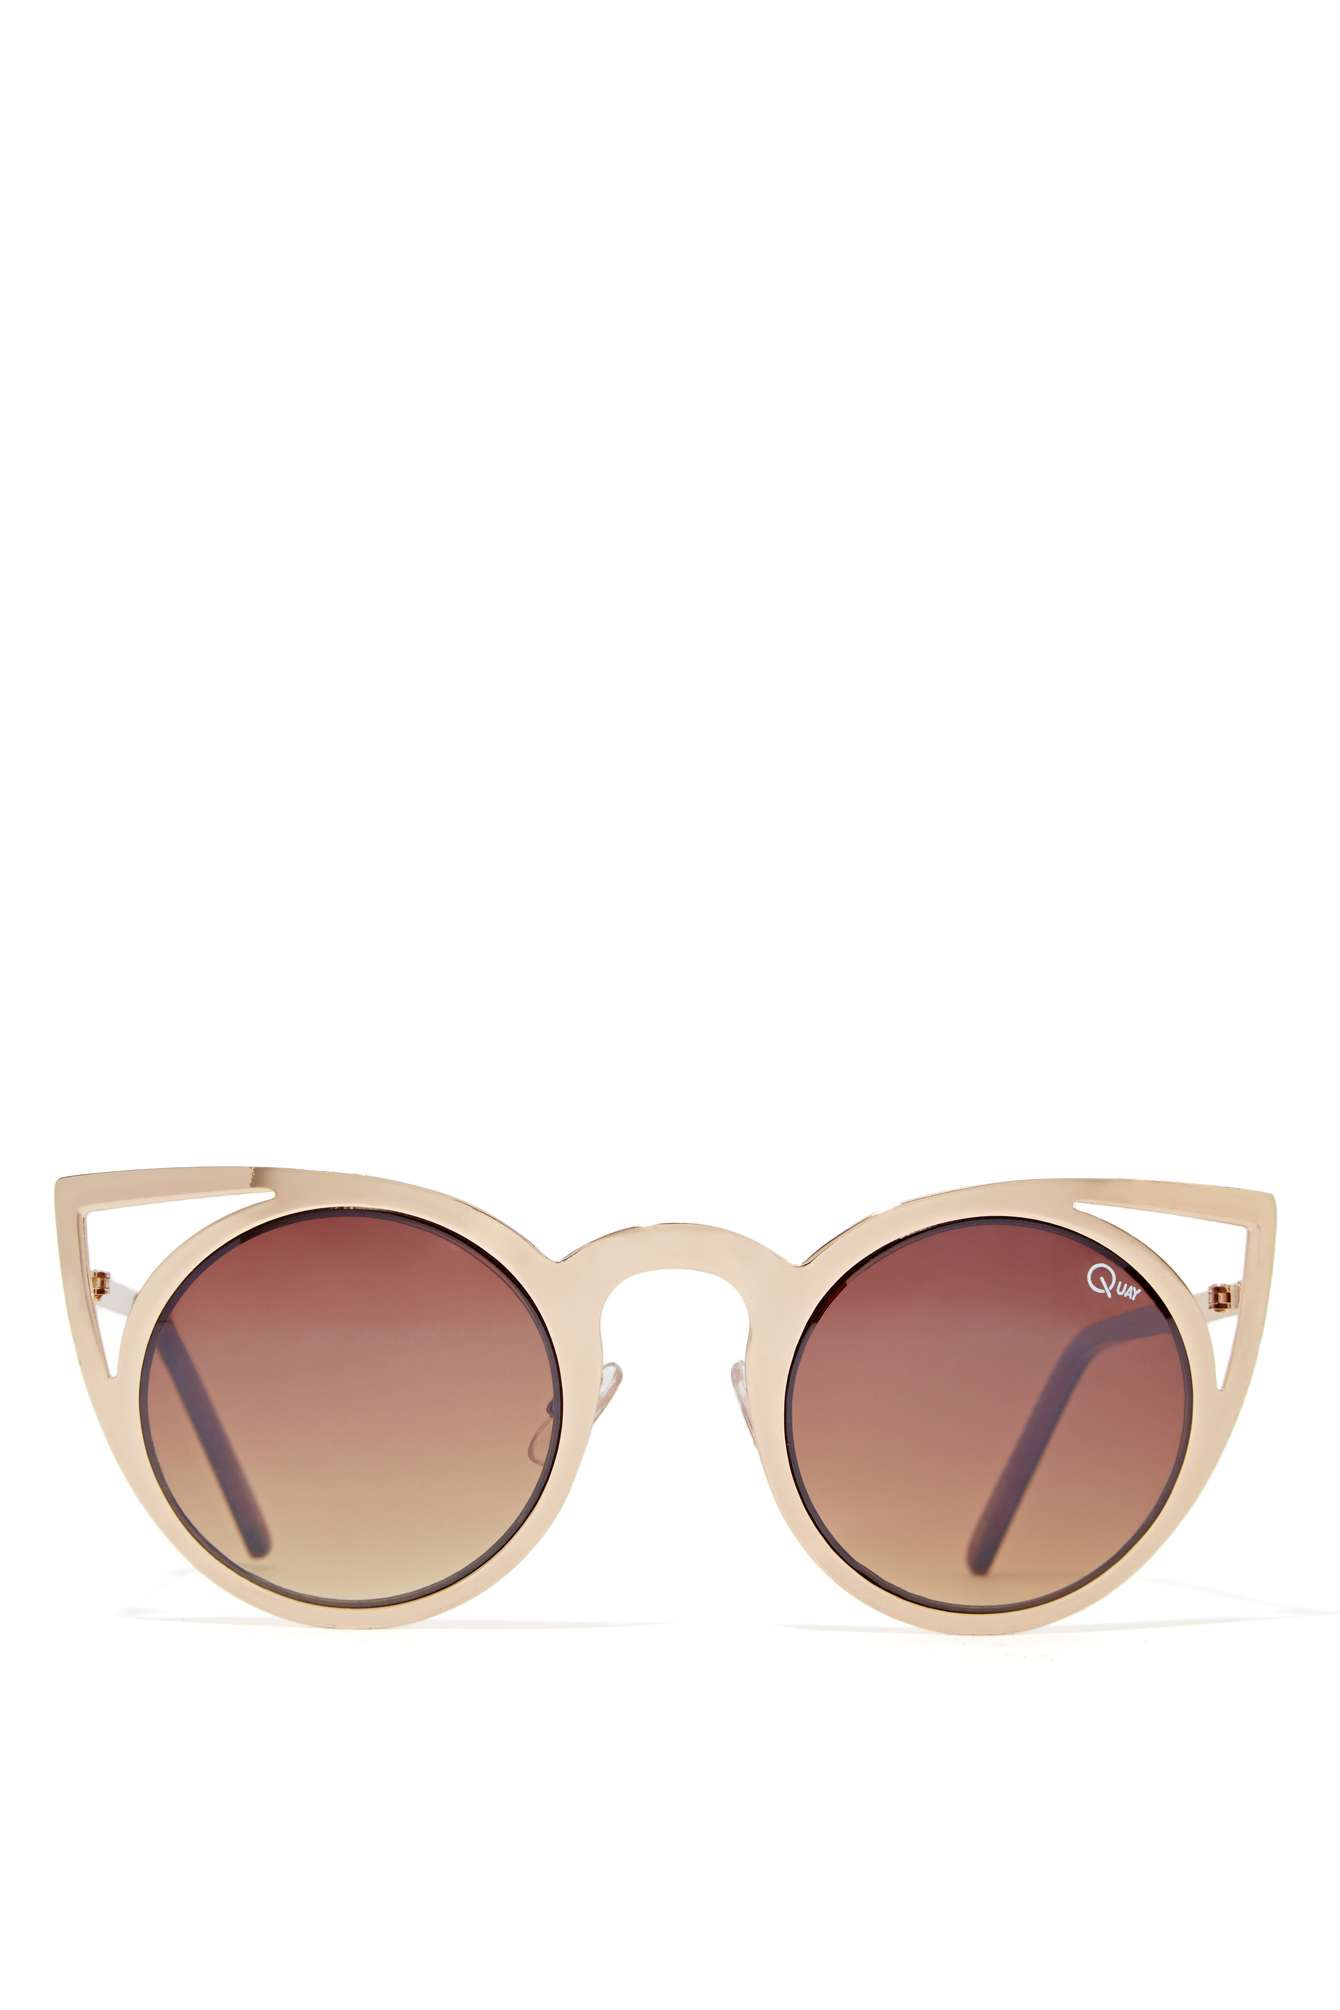 Quay Invader Cat Eye Sunglasses